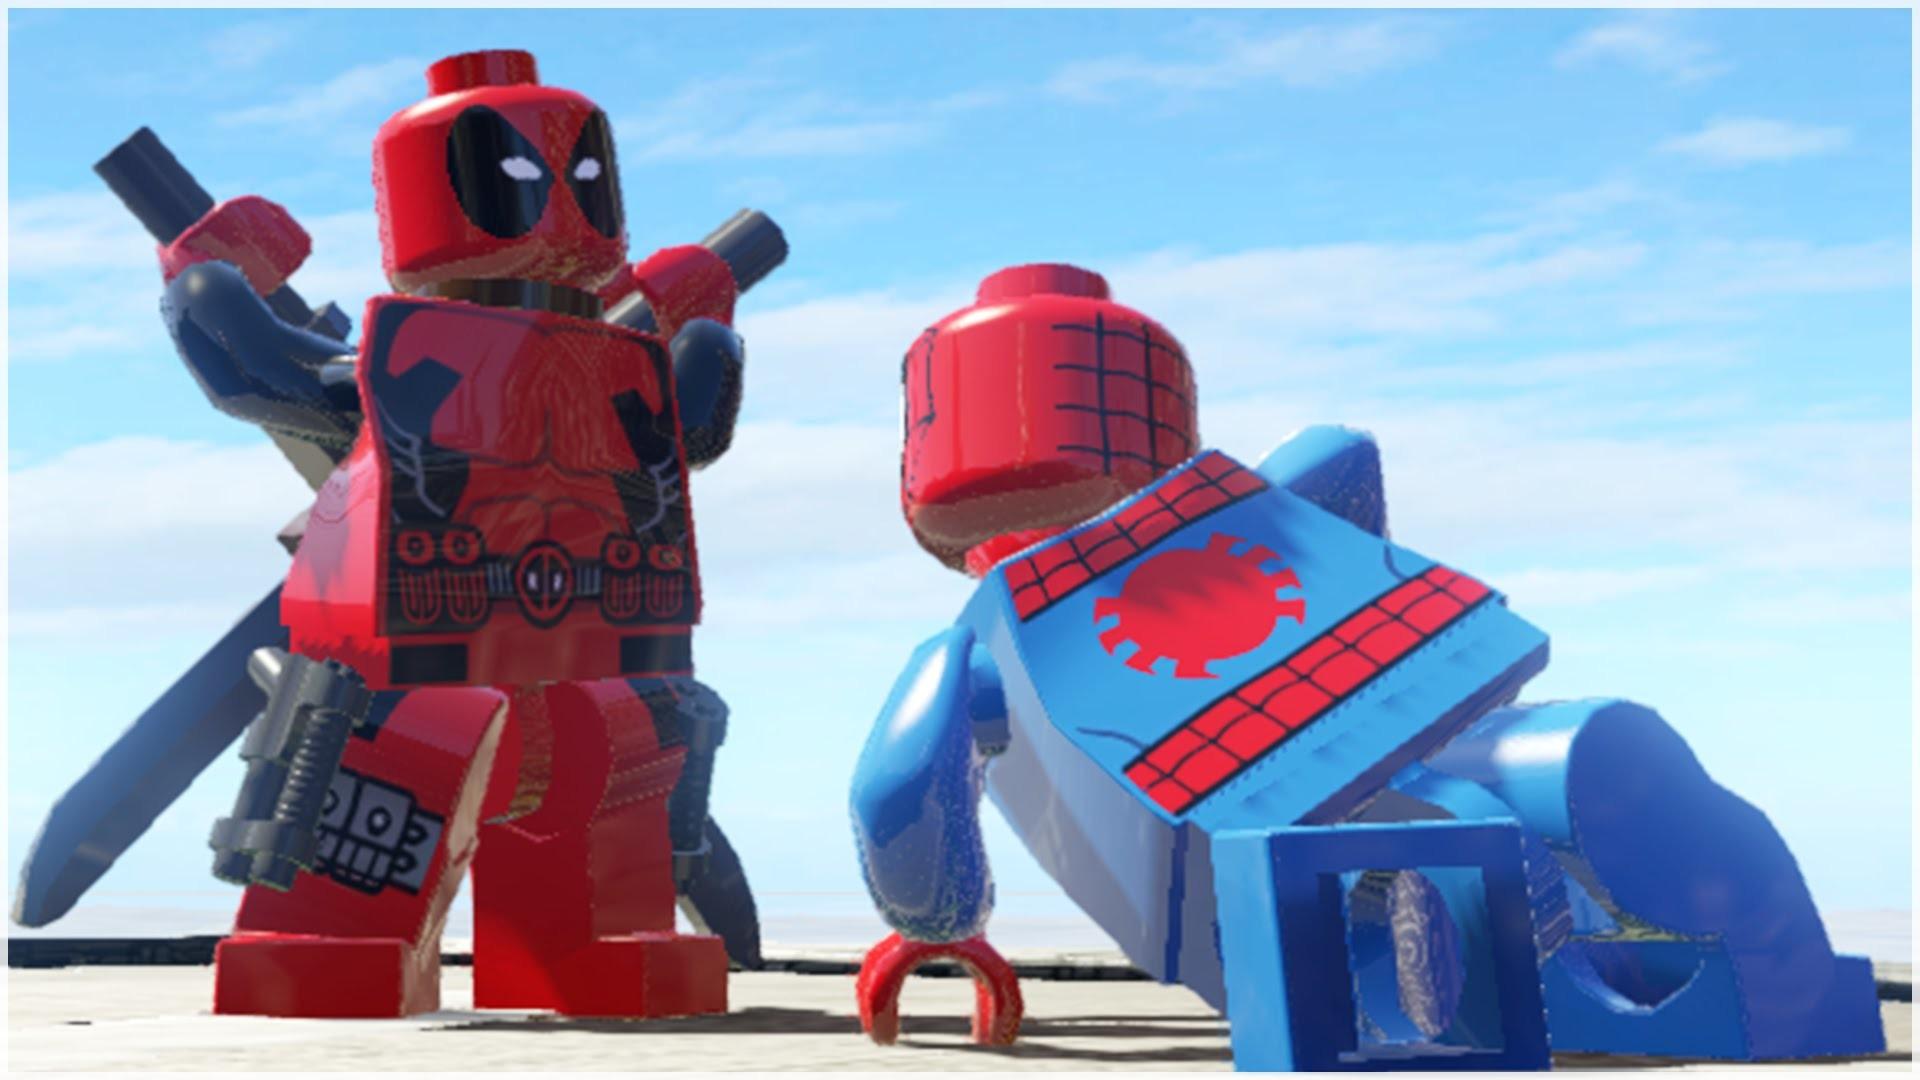 LEGO DEADPOOL VS LEGO SPIDER-MAN (SPIDERMAN) – CRAZY BATTLE (LEGO Marvel  Super Heroes)